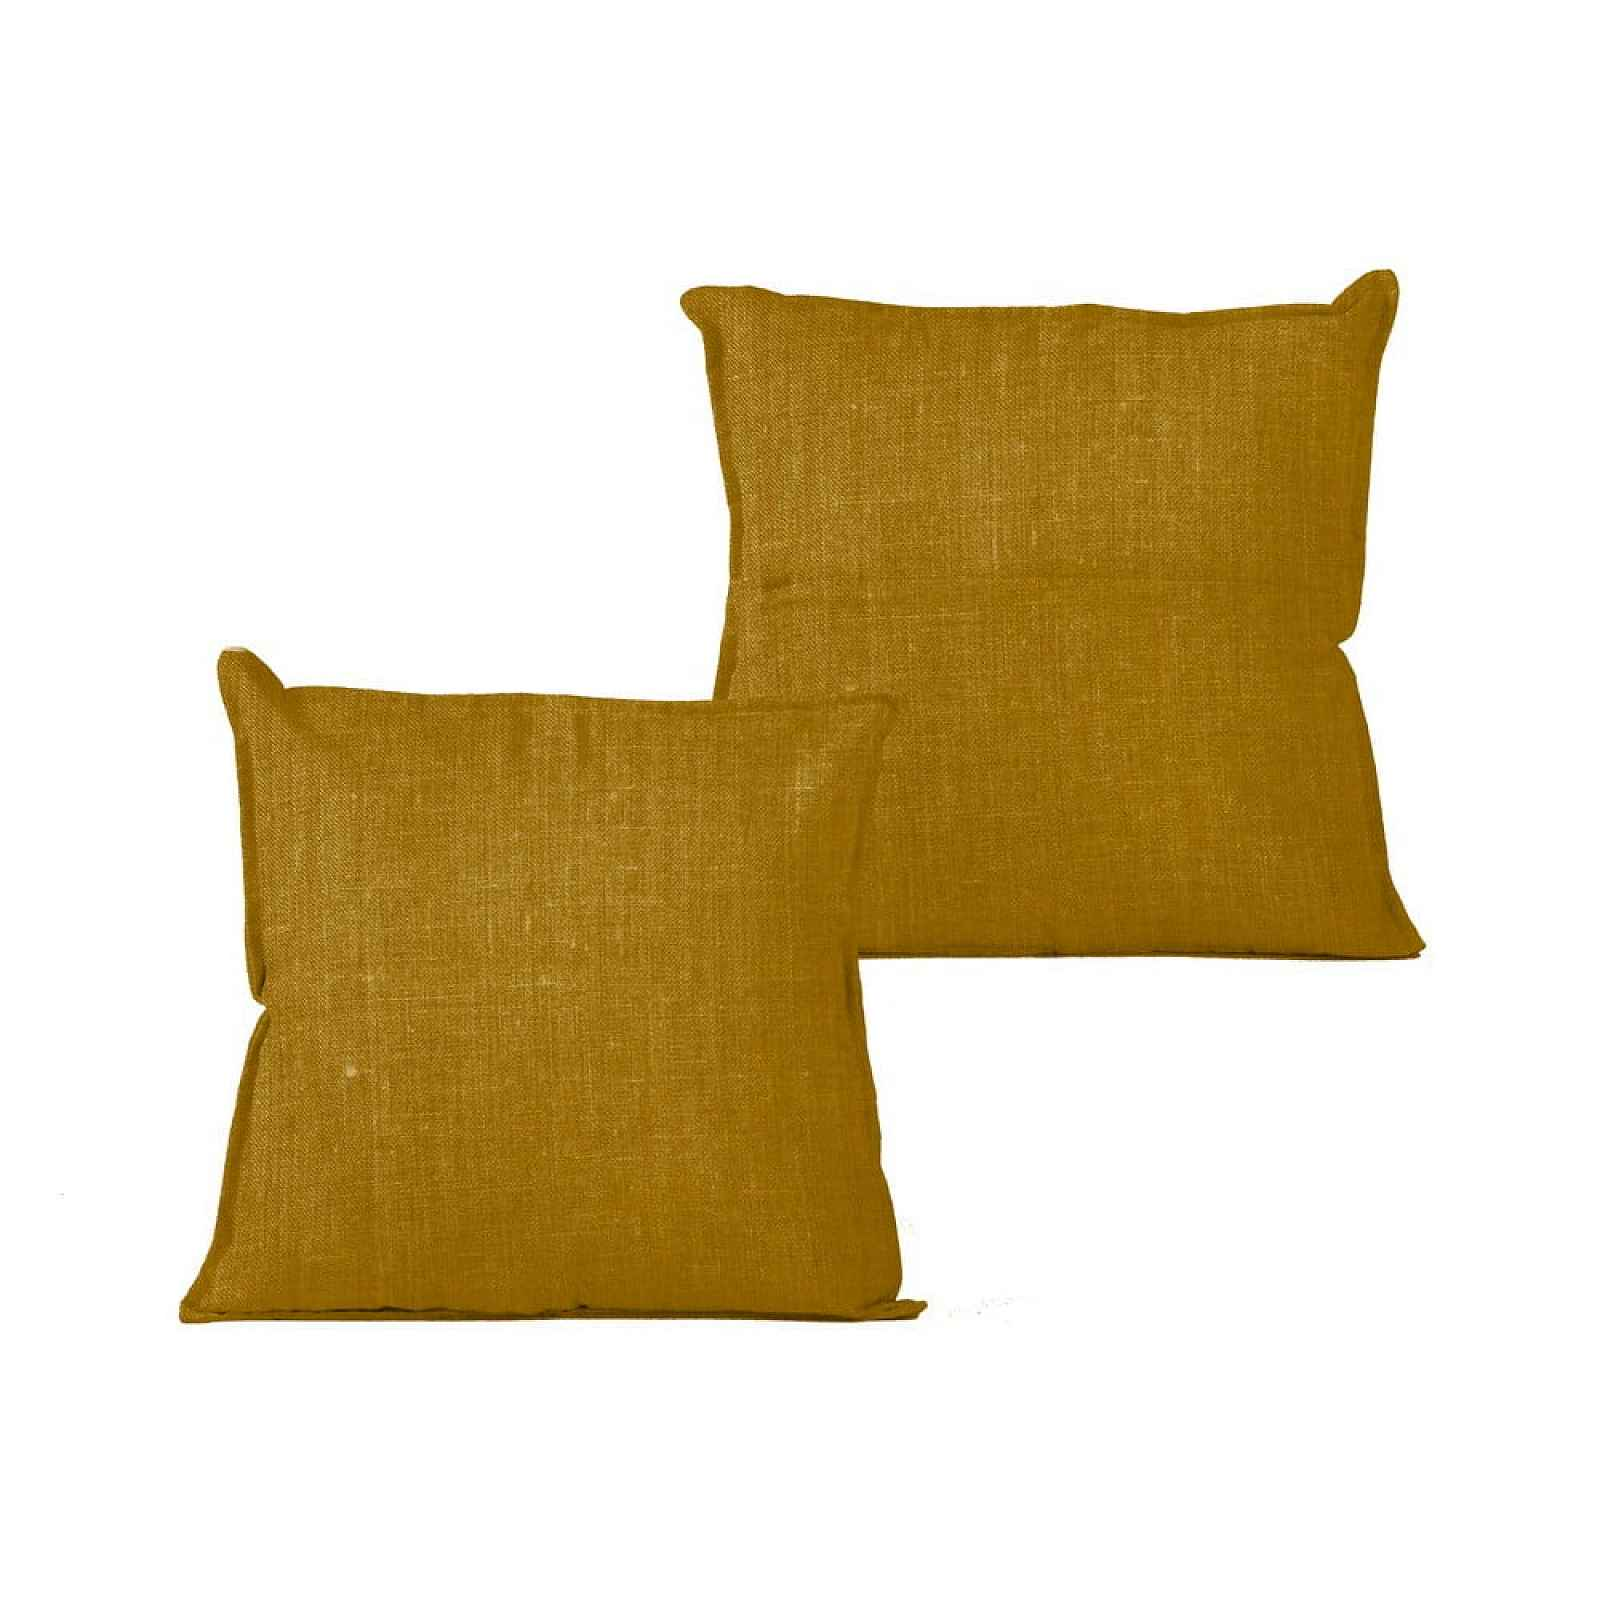 Hořčičný polštář Linen Couture Mustard,45x45cm